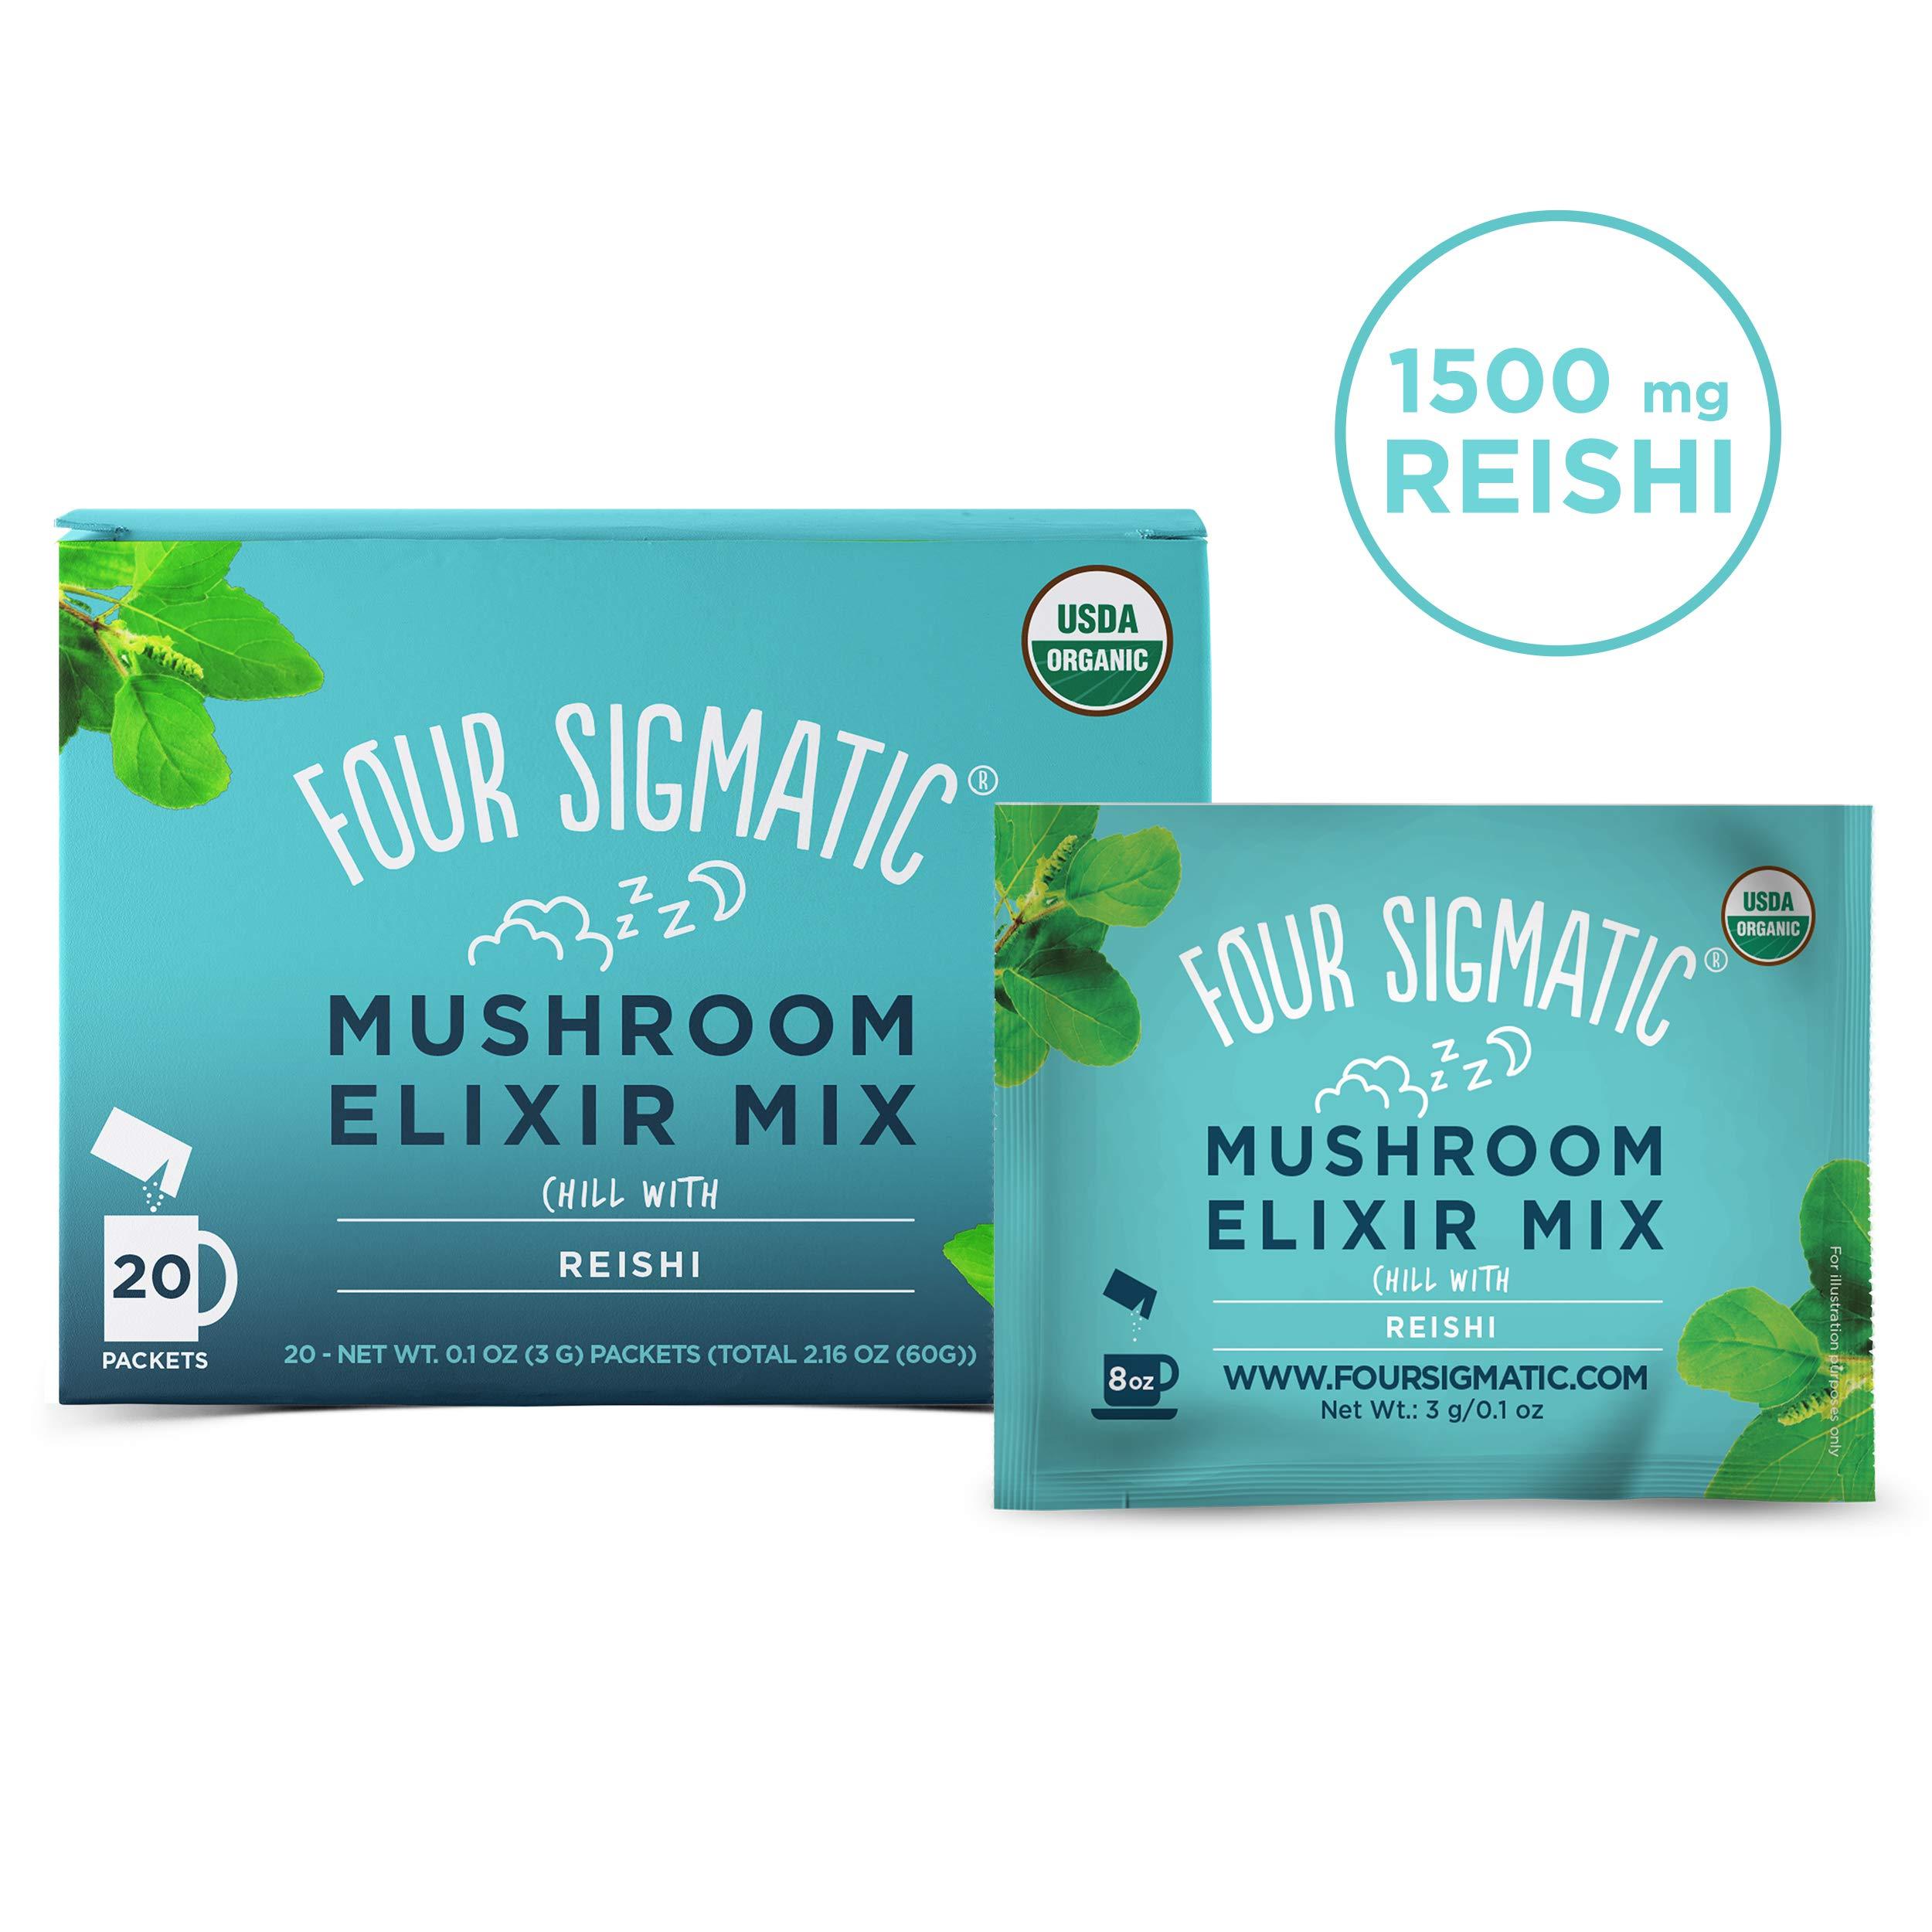 Four Sigmatic Reishi Mushroom Elixir - USDA Organic Reishi Mushroom Powder - Natural Calm, Relax, Sleep - Vegan, Paleo - 20 Count by Four Sigma Foods